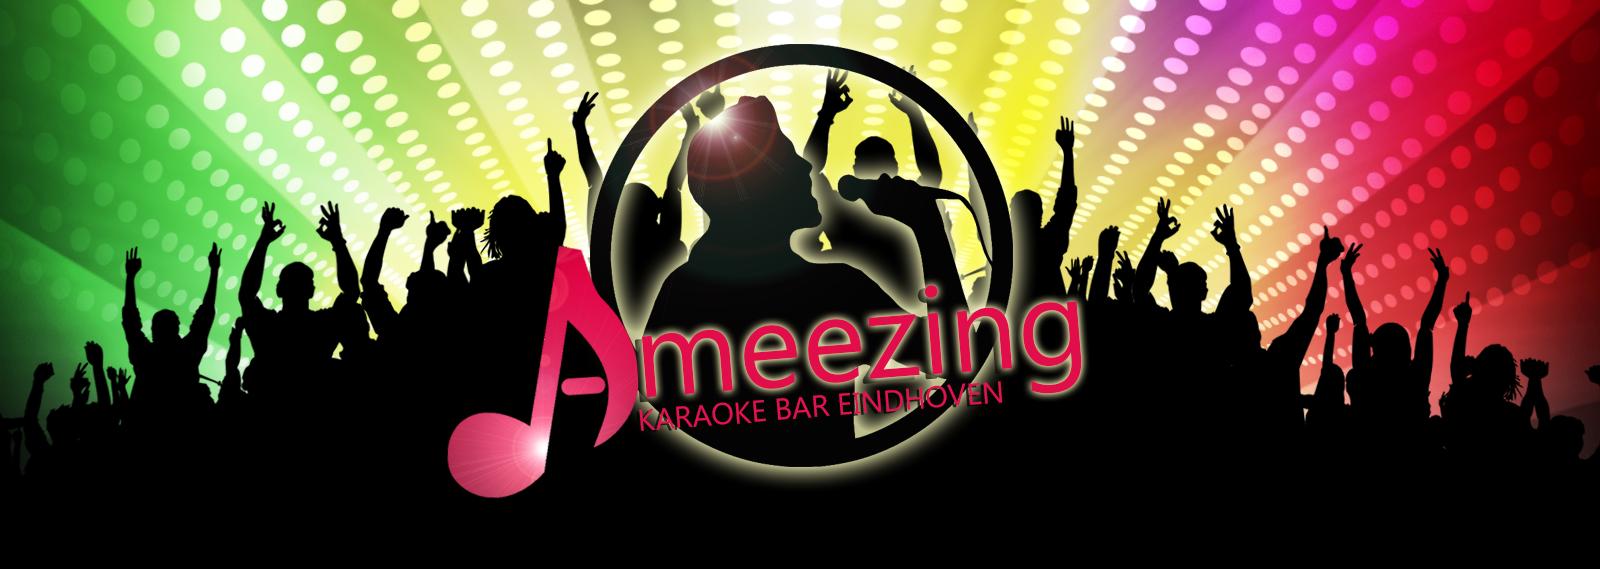 Karaokebar Ameezing Eindhoven